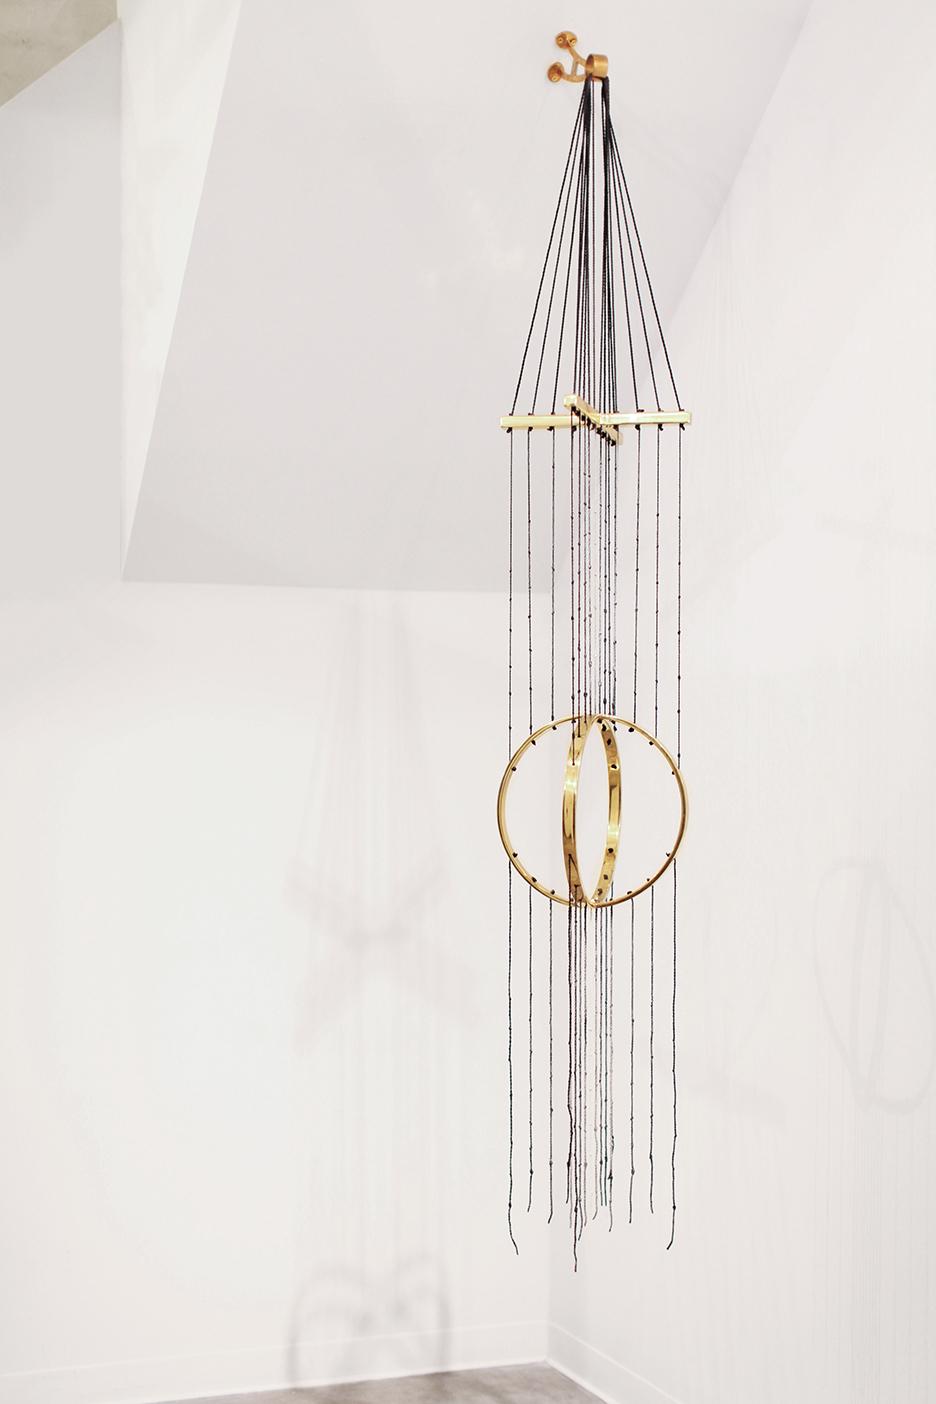 Steven Pestana , Khipu (Archæometric Reckoner) , Cast Brass, Rope, Ink 2015